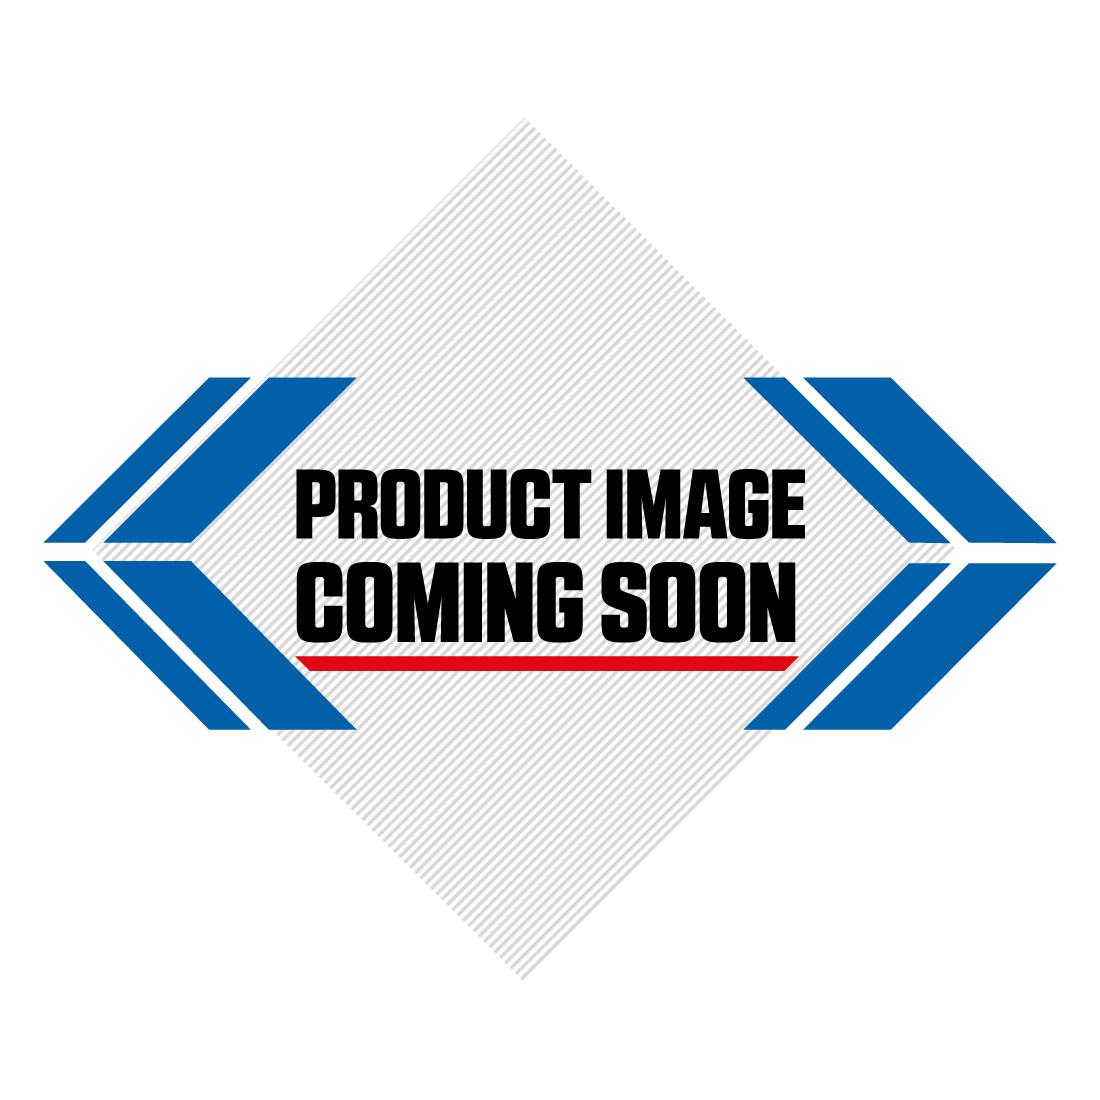 Silkolene Comp 4 10w-40 XP Ester Based Semi Synthetic Bike Engine Oil - 4 Cube Image-2>